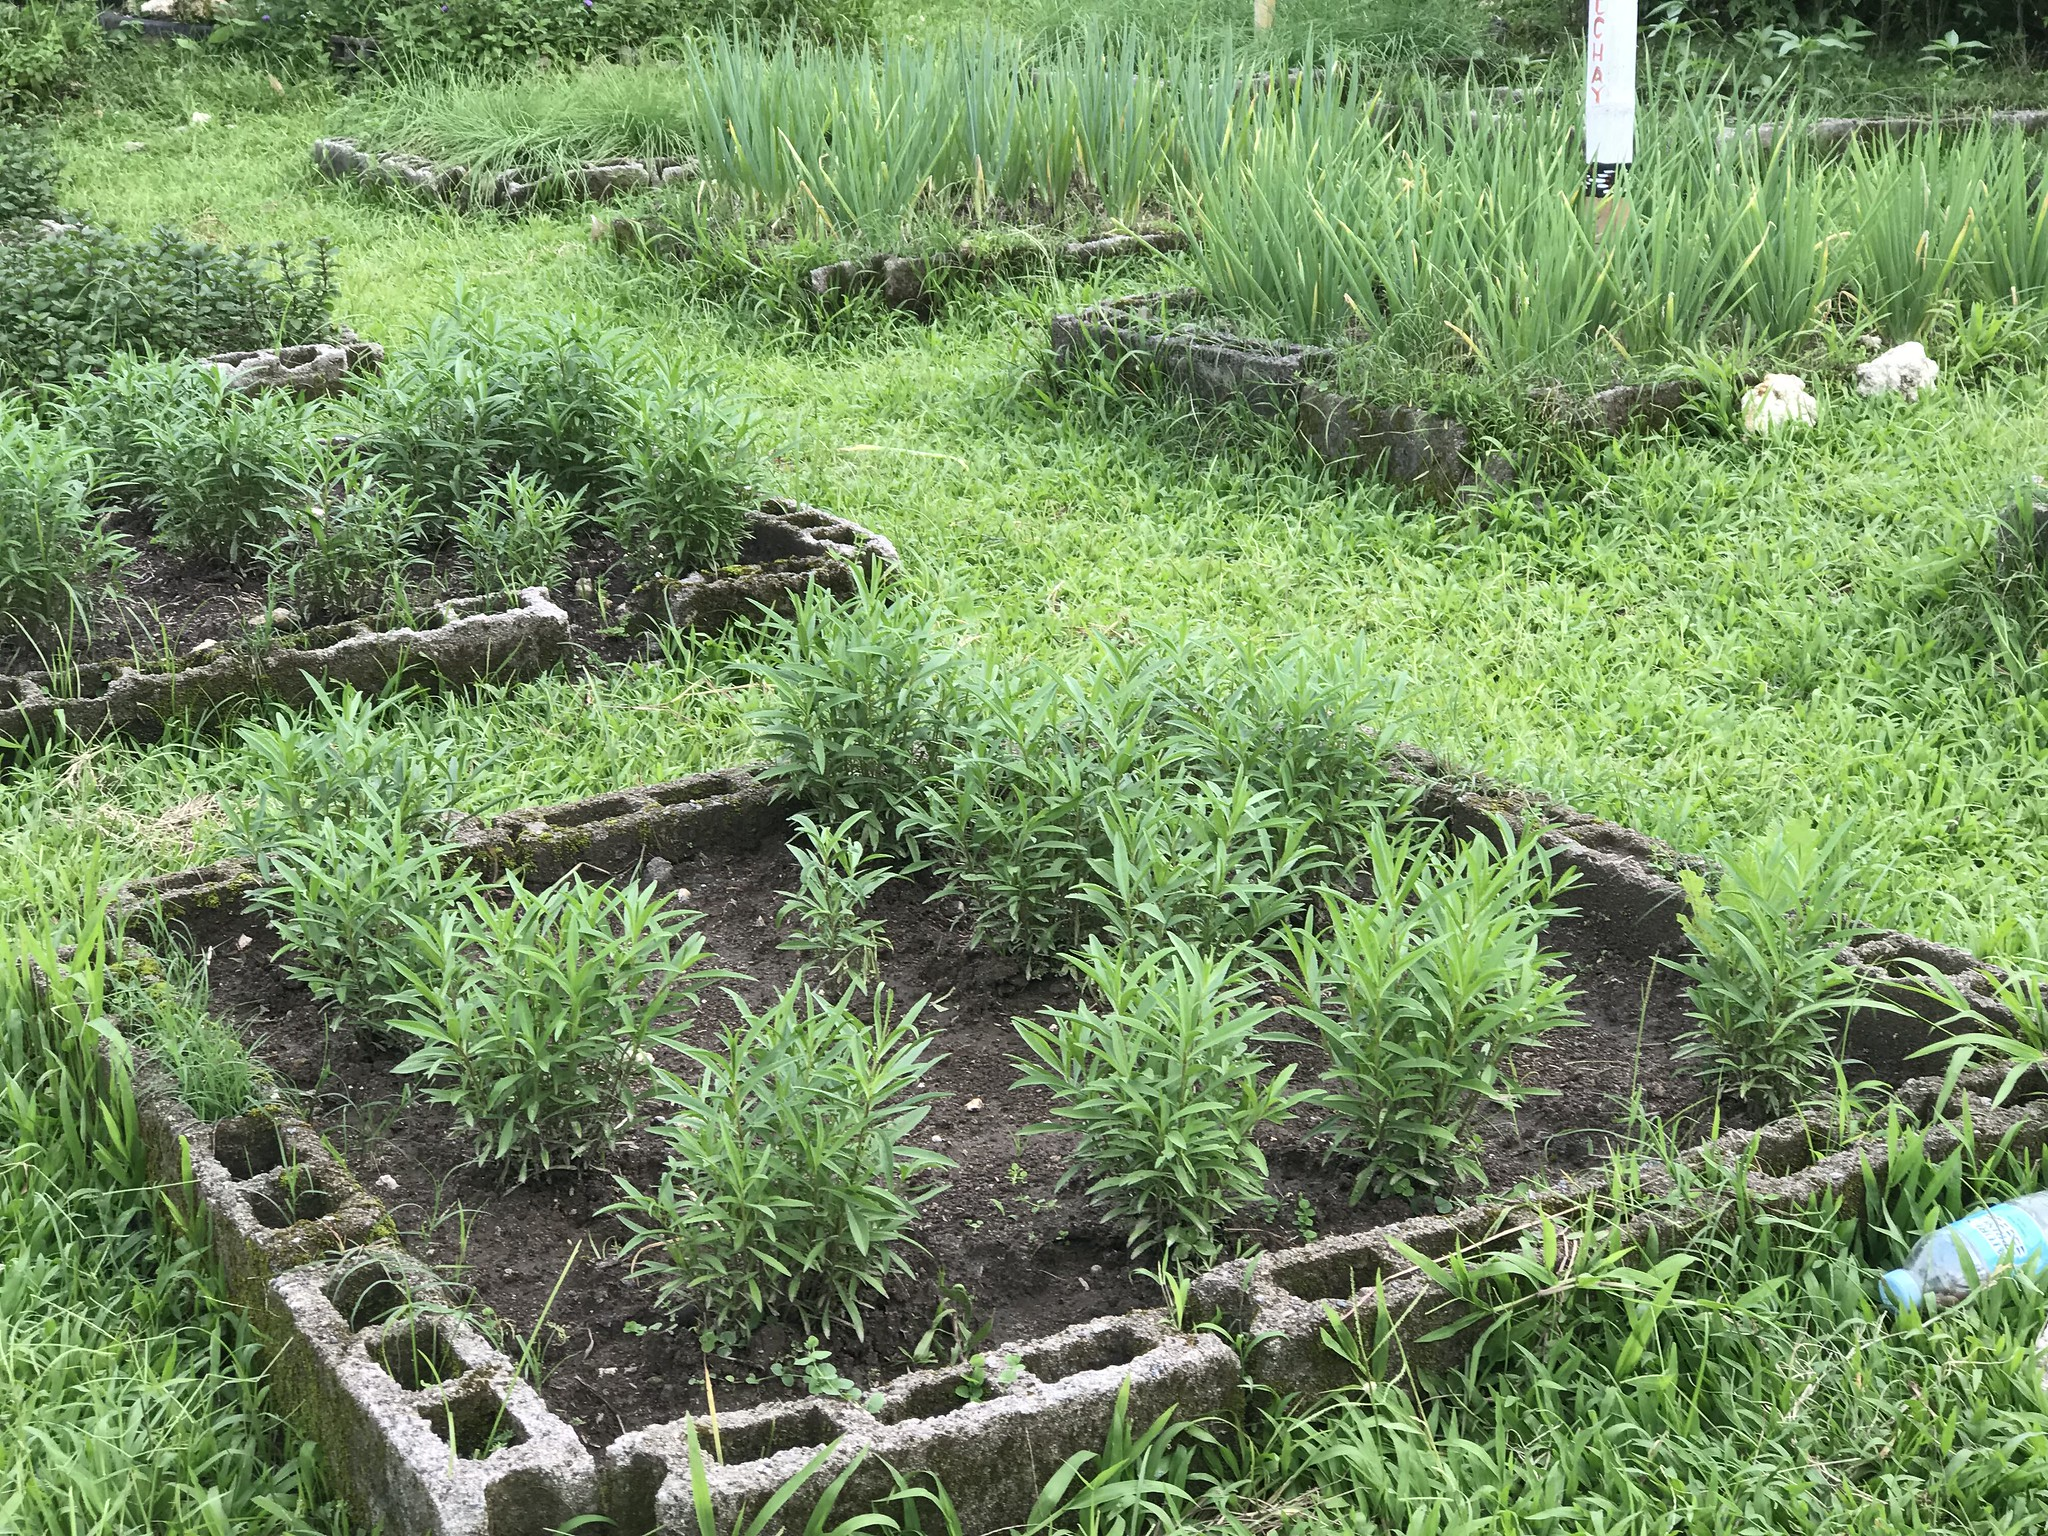 sebul-farm-lake-sebu-square-foot-farming.jpg